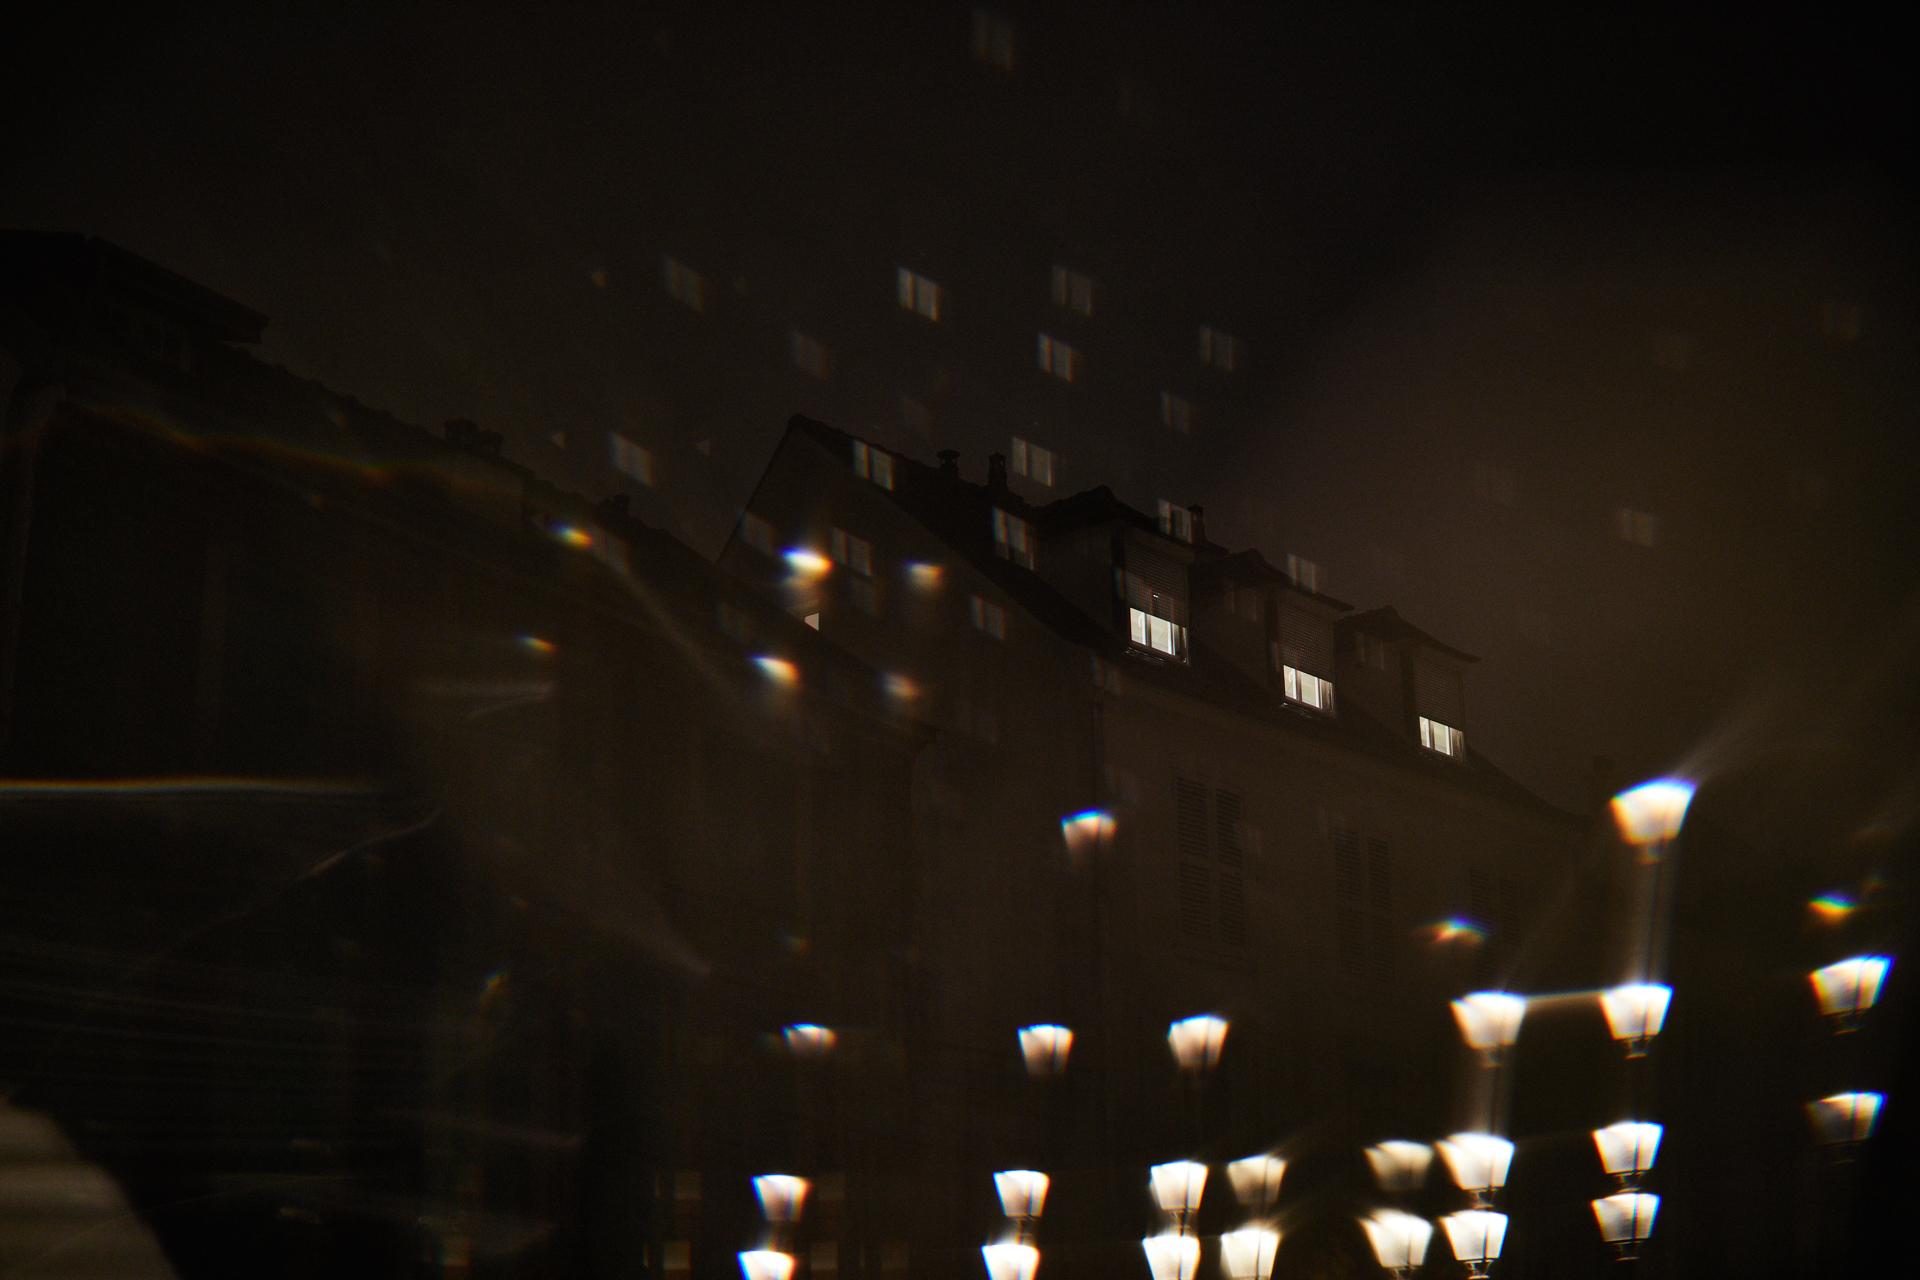 Paryż nocą - sesja ślubna za granicą